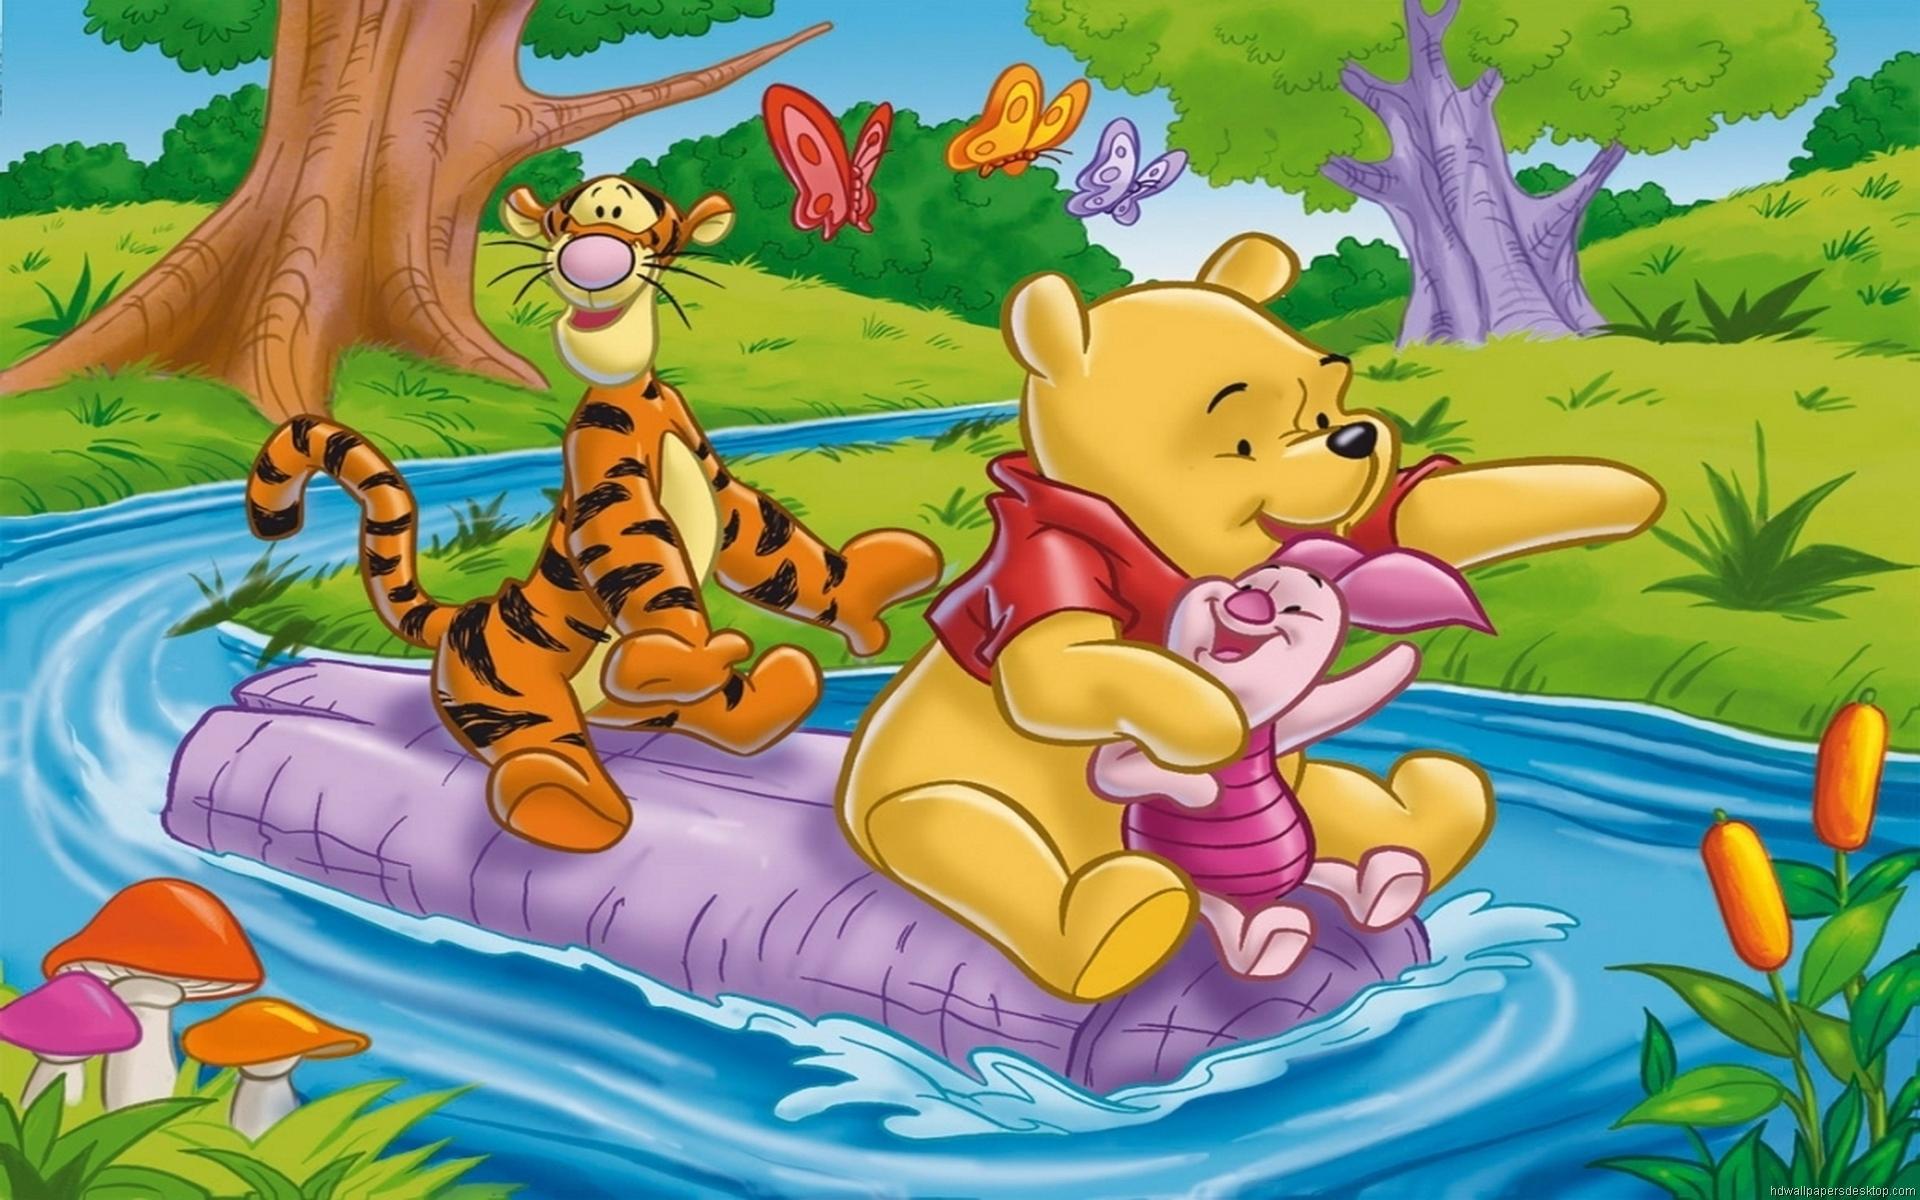 [77+] Winnie The Pooh Desktop Wallpaper on WallpaperSafari